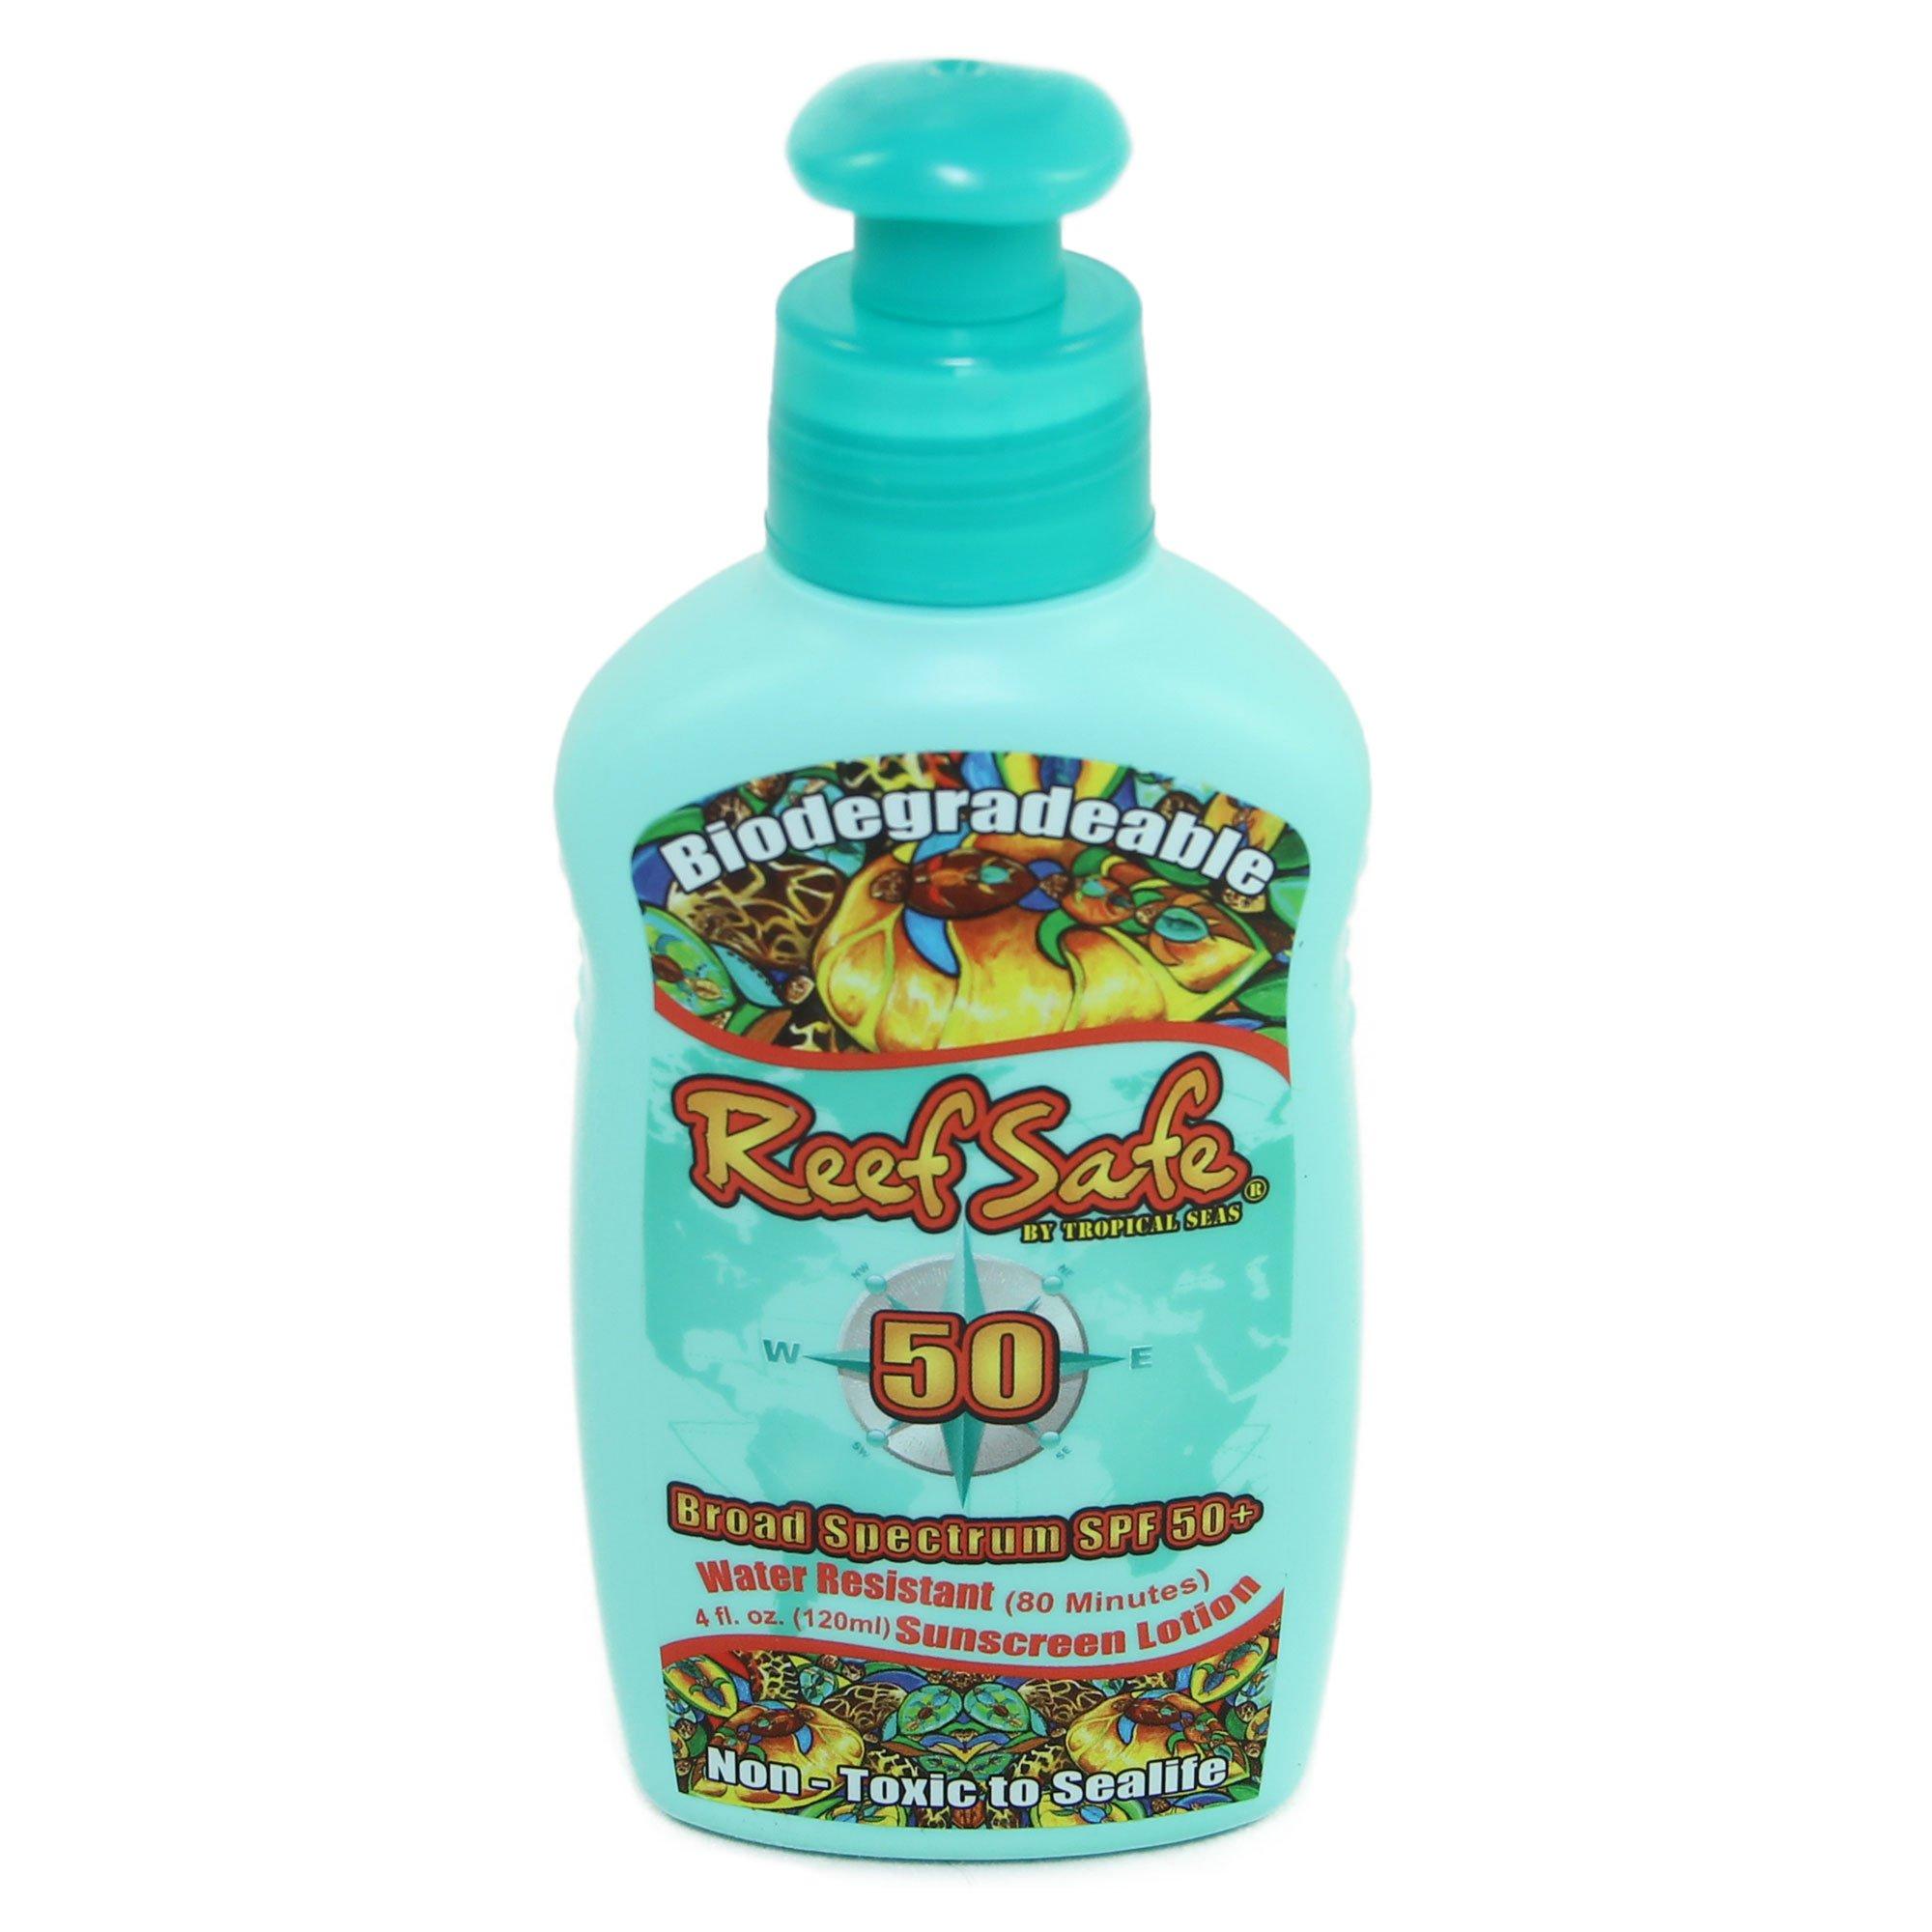 Reef Safe Biodegradable Waterproof SPF 50+ Sunscreen Lotion, 4 fl. oz